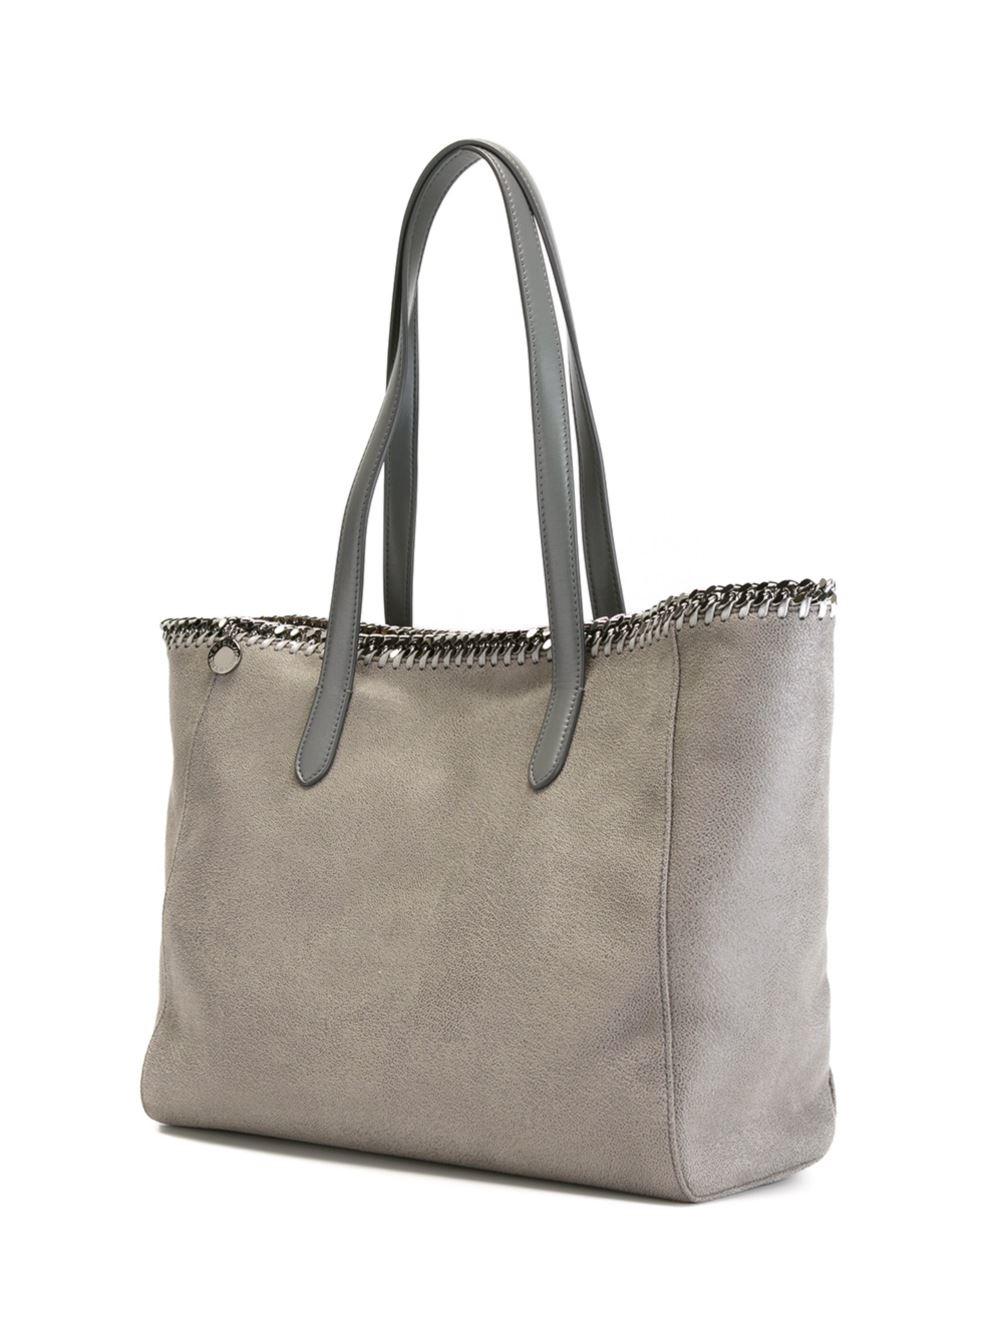 Stella McCartney Leather 'falabella' Shopper Tote in Grey (Grey)